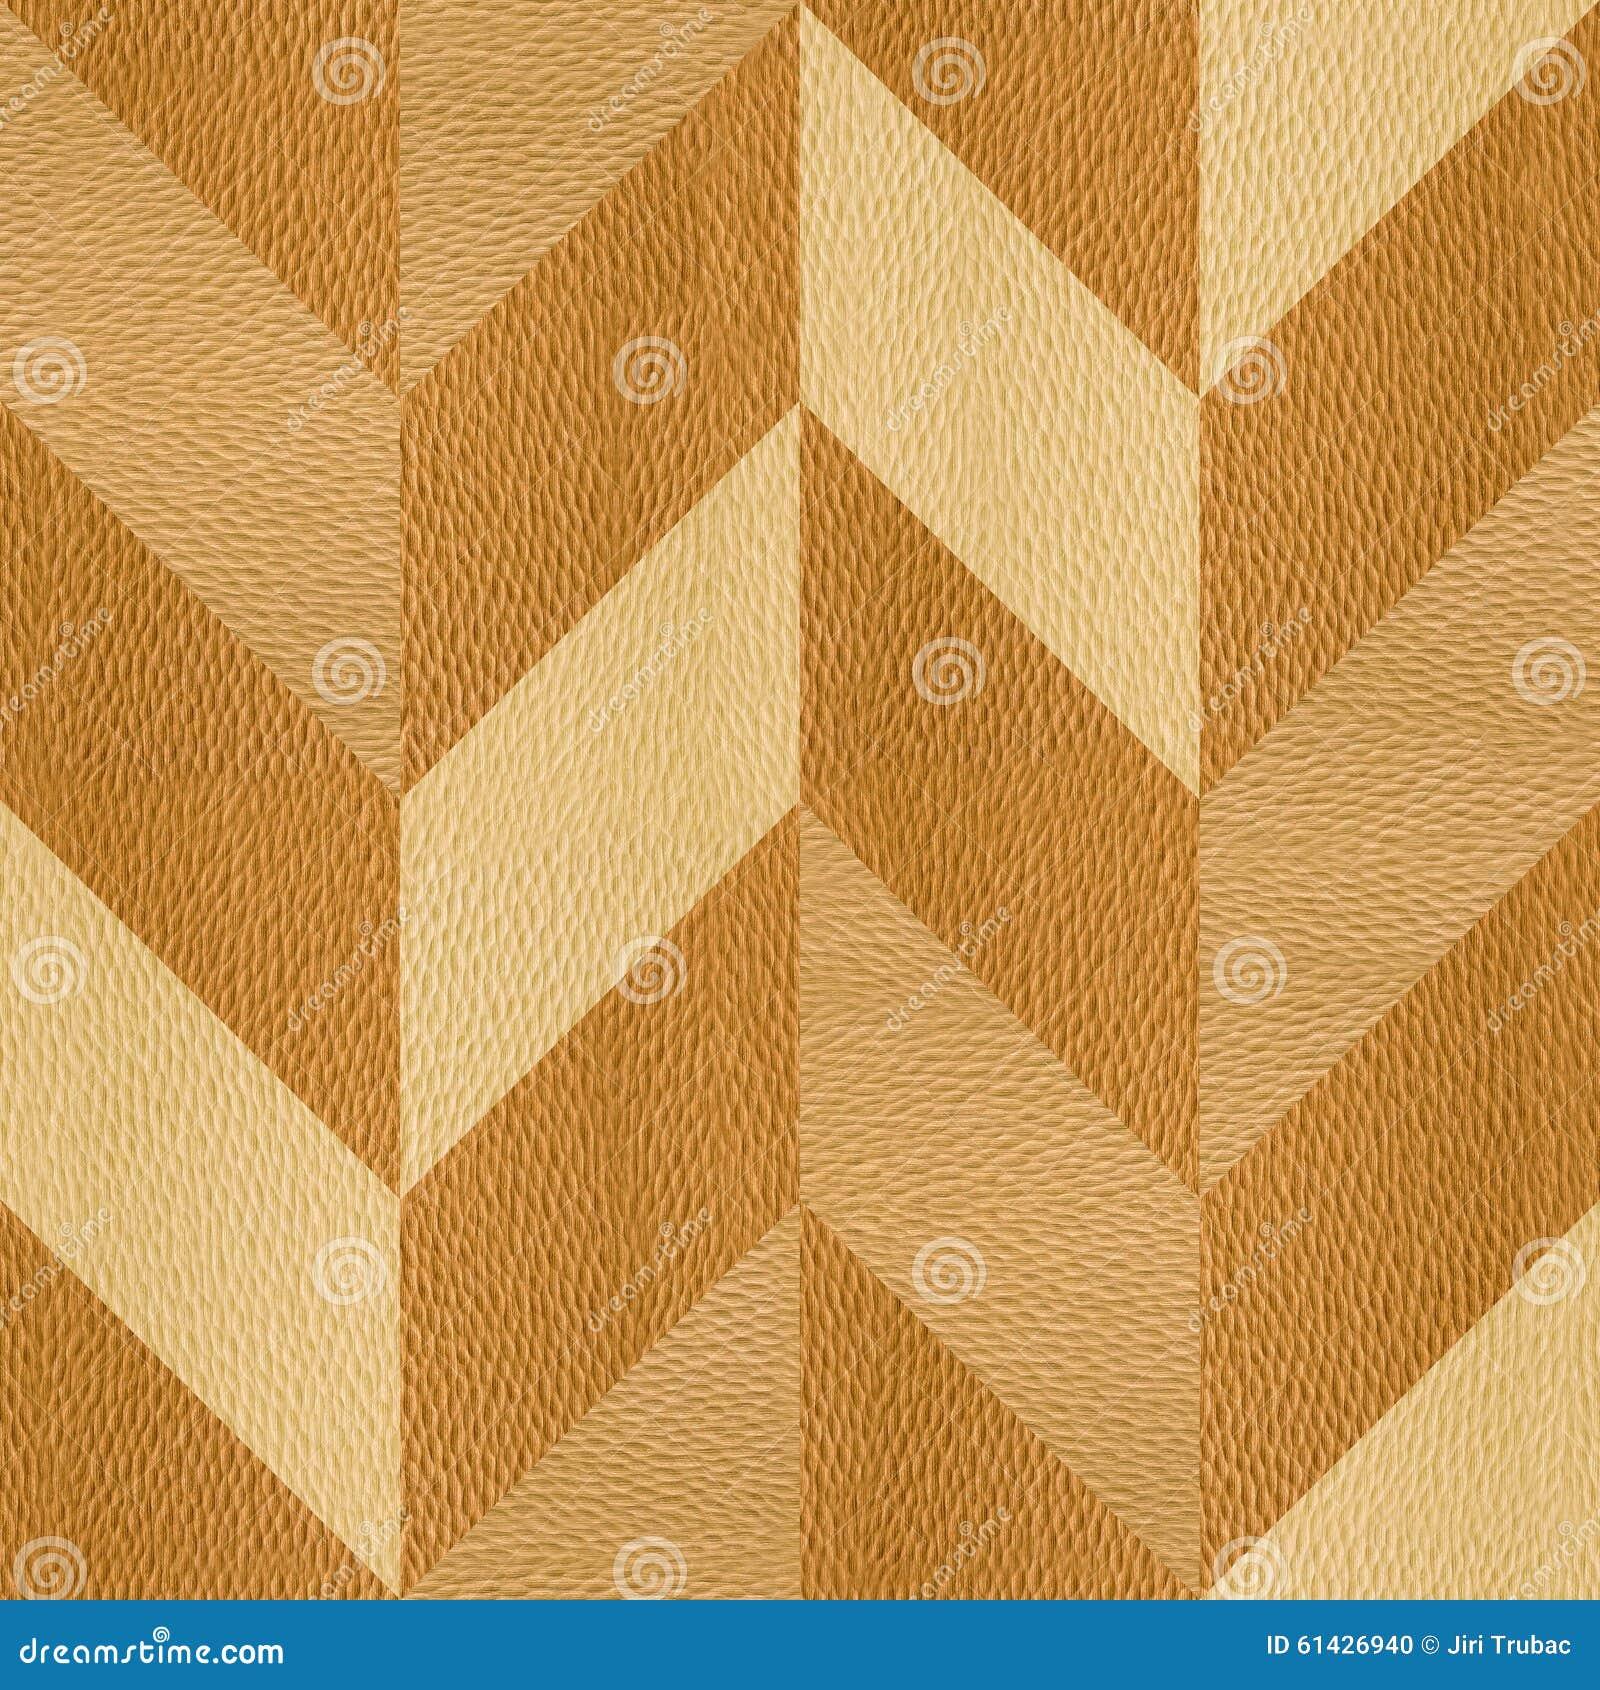 Abstract Decorative Wallpaper